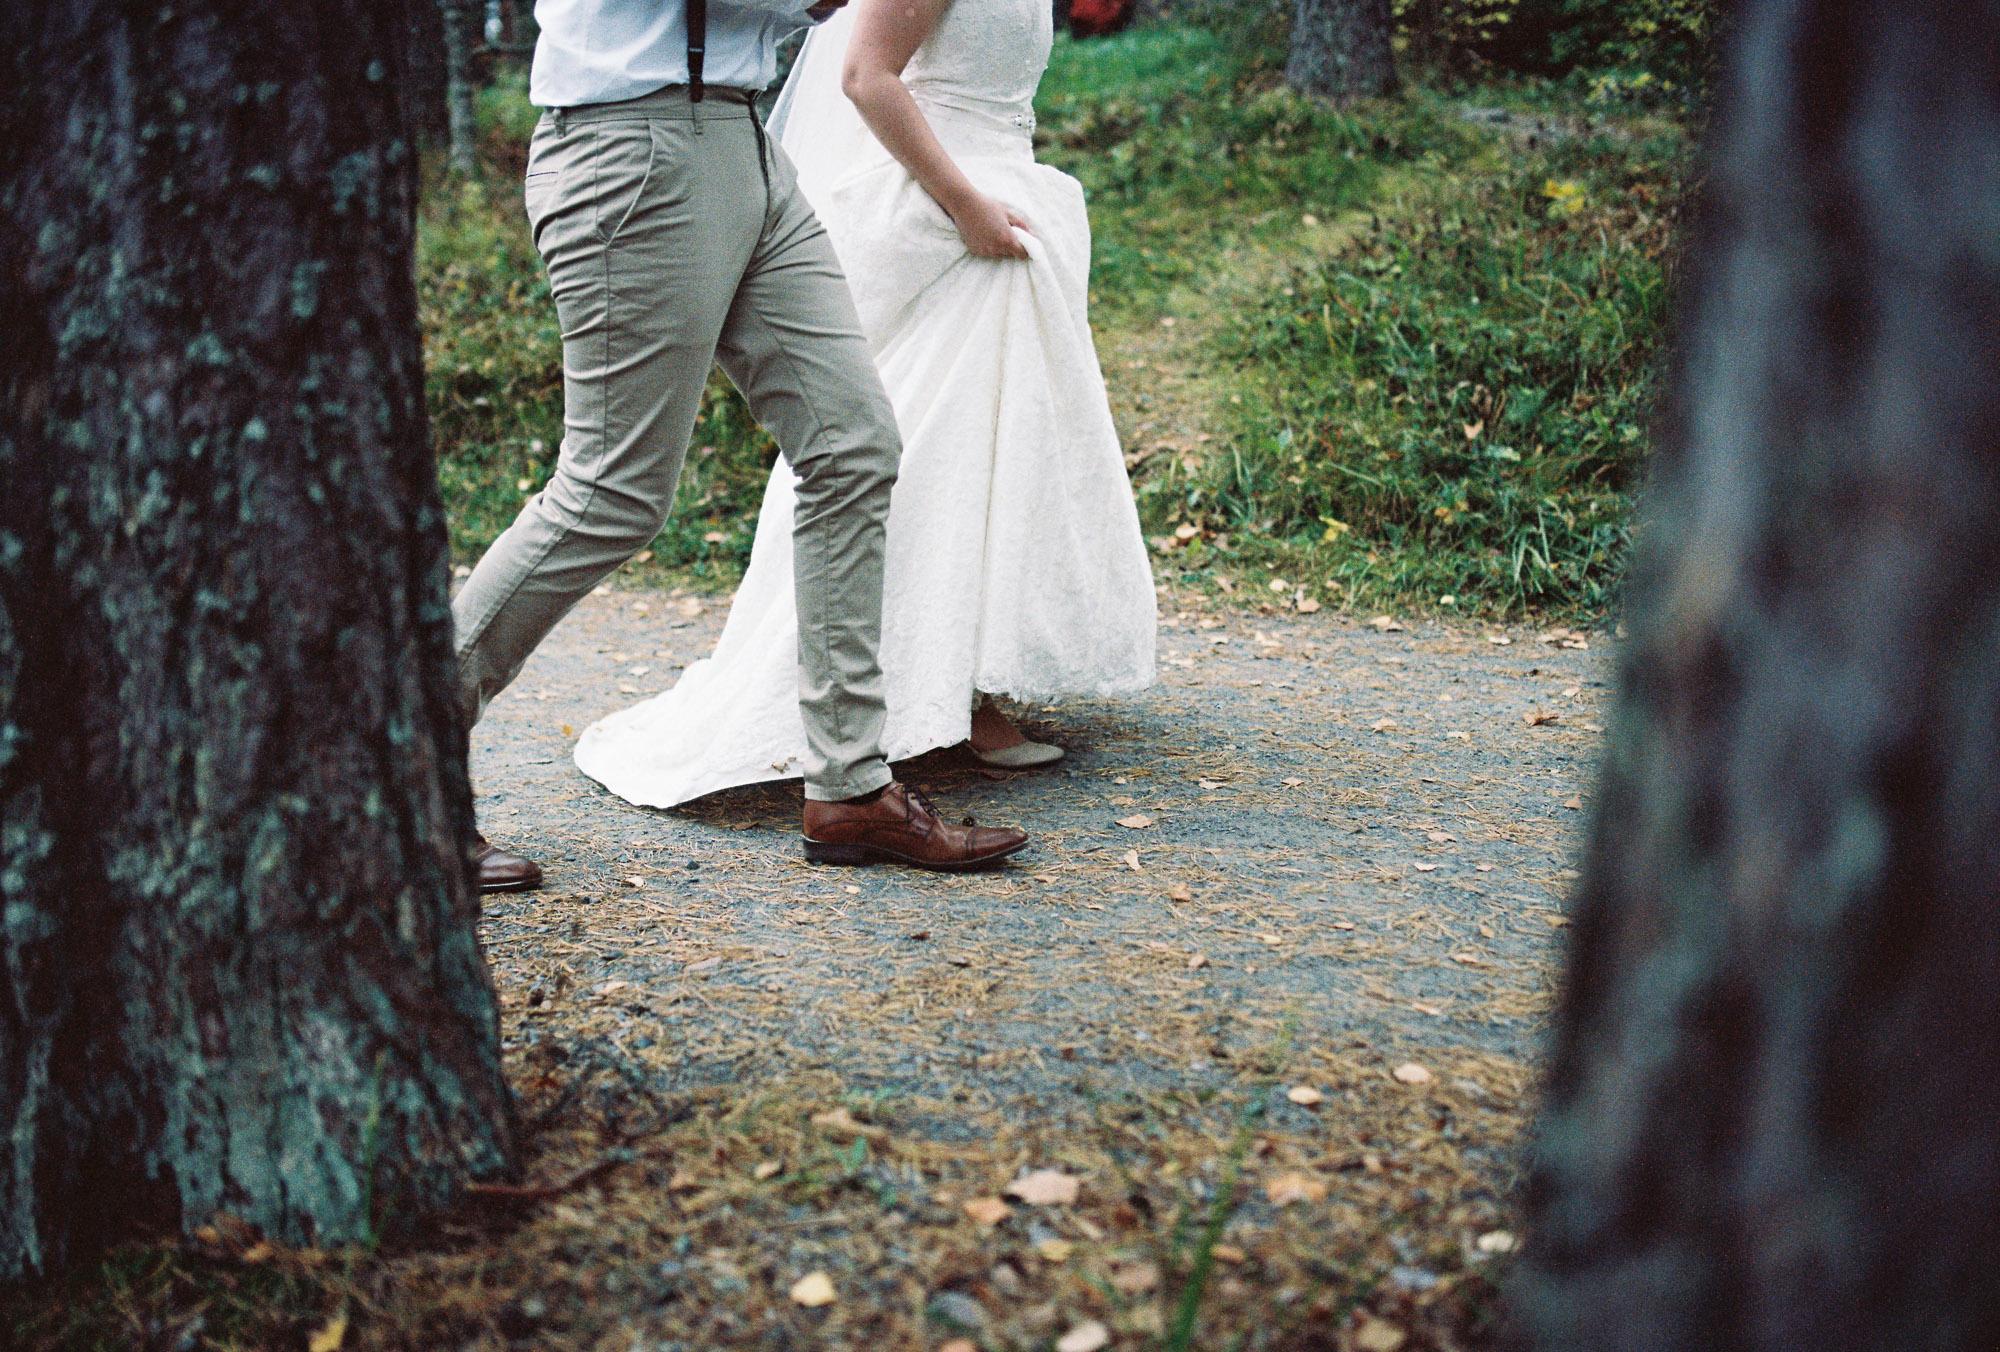 jere-satamo-analog-film-wedding-photographer-finland-136.jpg